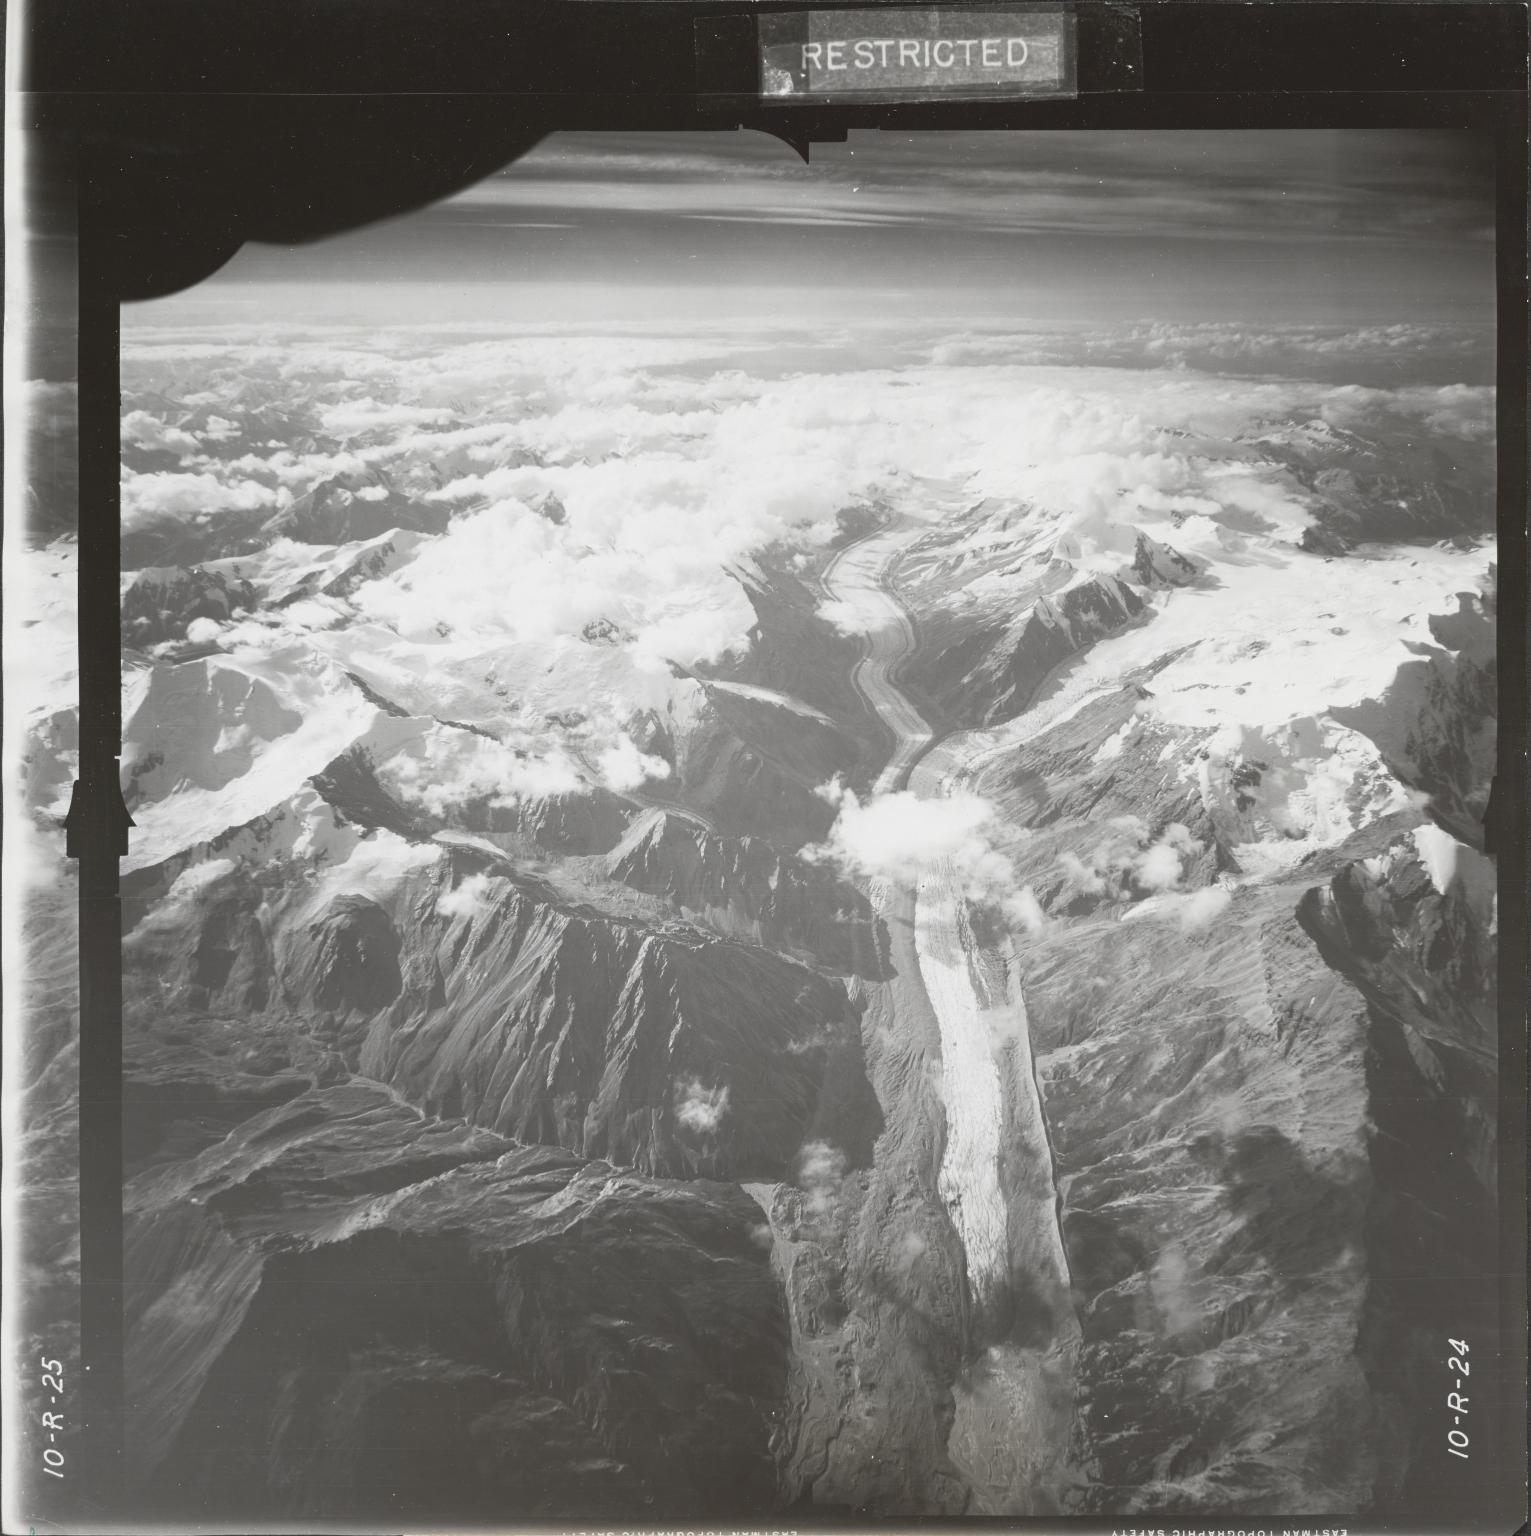 Gerstle River, aerial photograph FL 18 R-24, Alaska